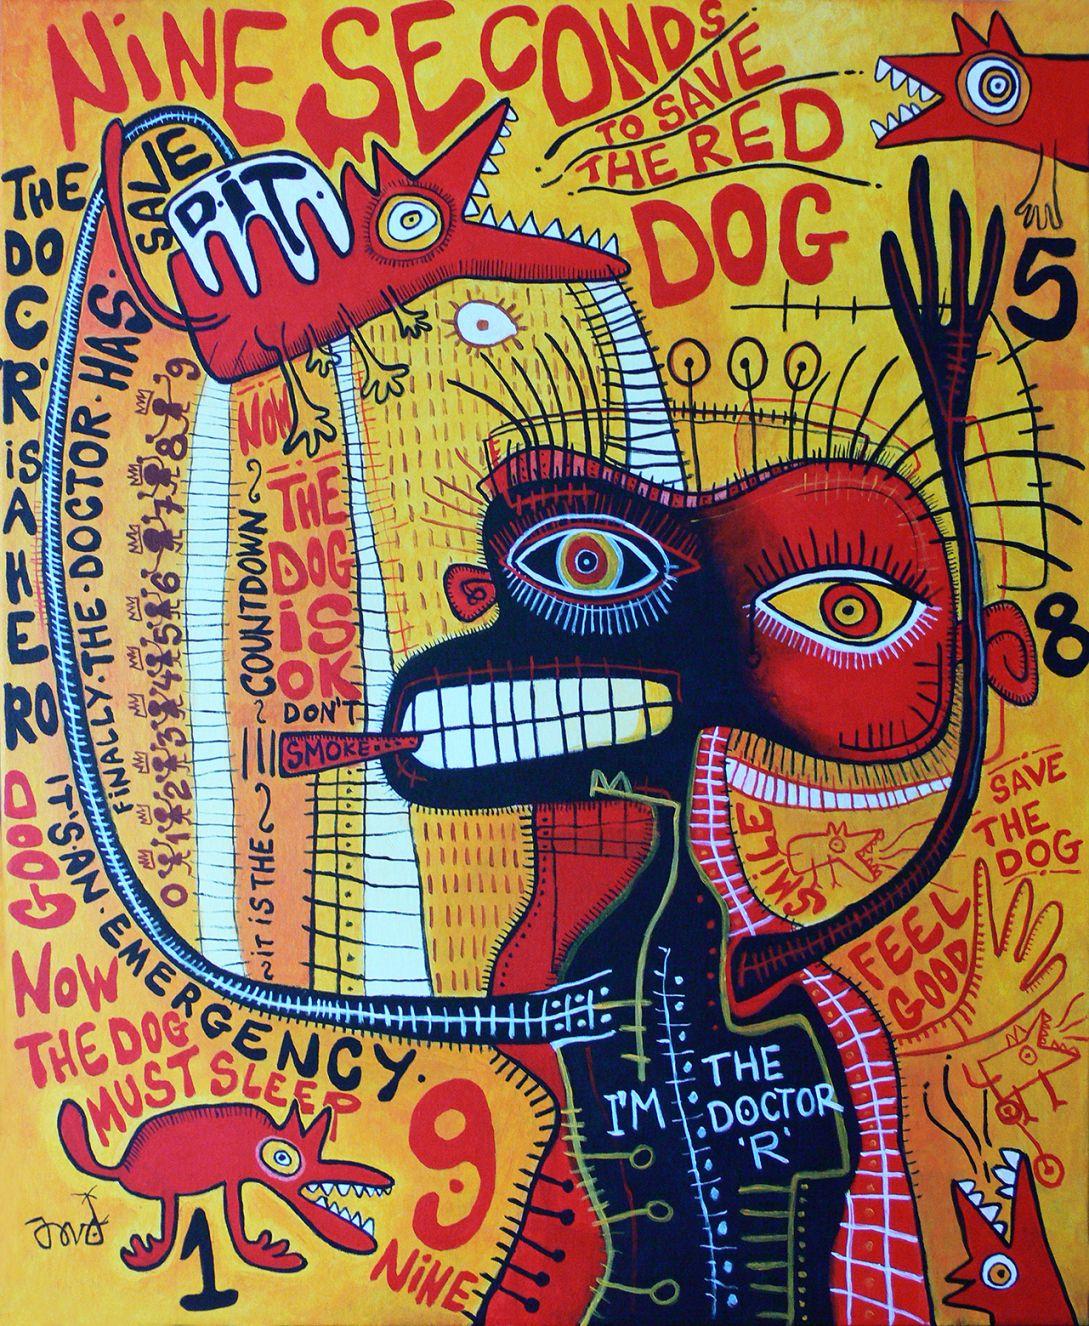 Nine seconds to save de Red Dog (2021) - David García Rincón